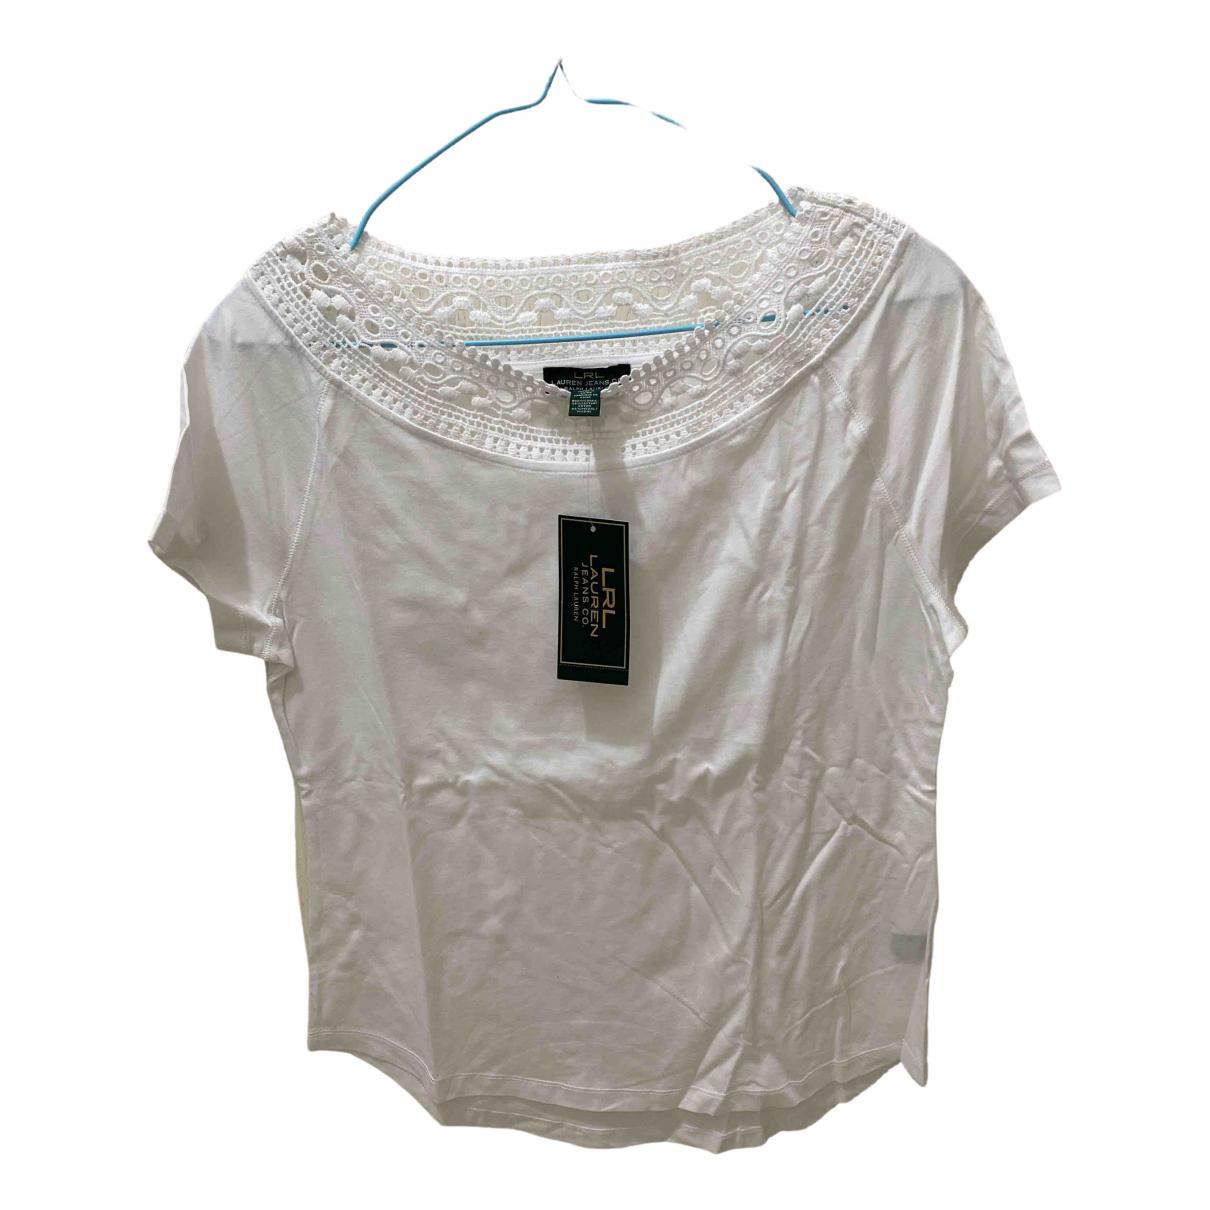 Lauren Ralph Lauren - Top   pour femme en coton - blanc